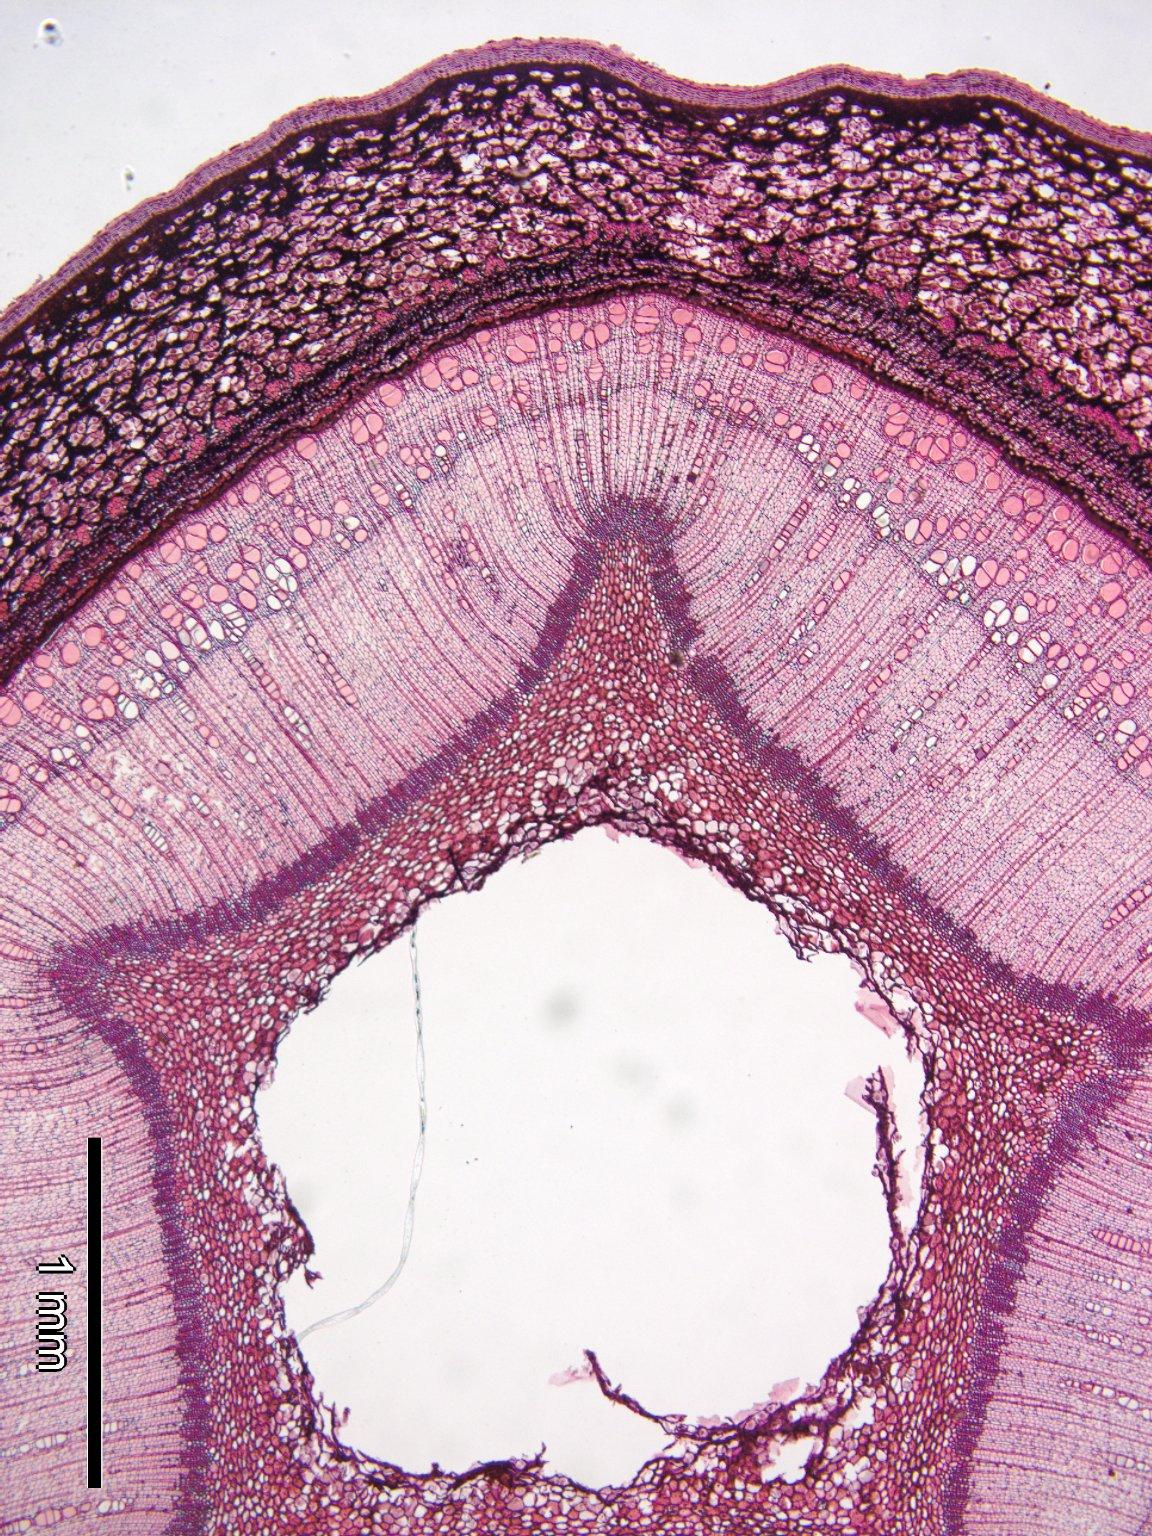 JUGLANDACEAE Pterocarya rhoifolia